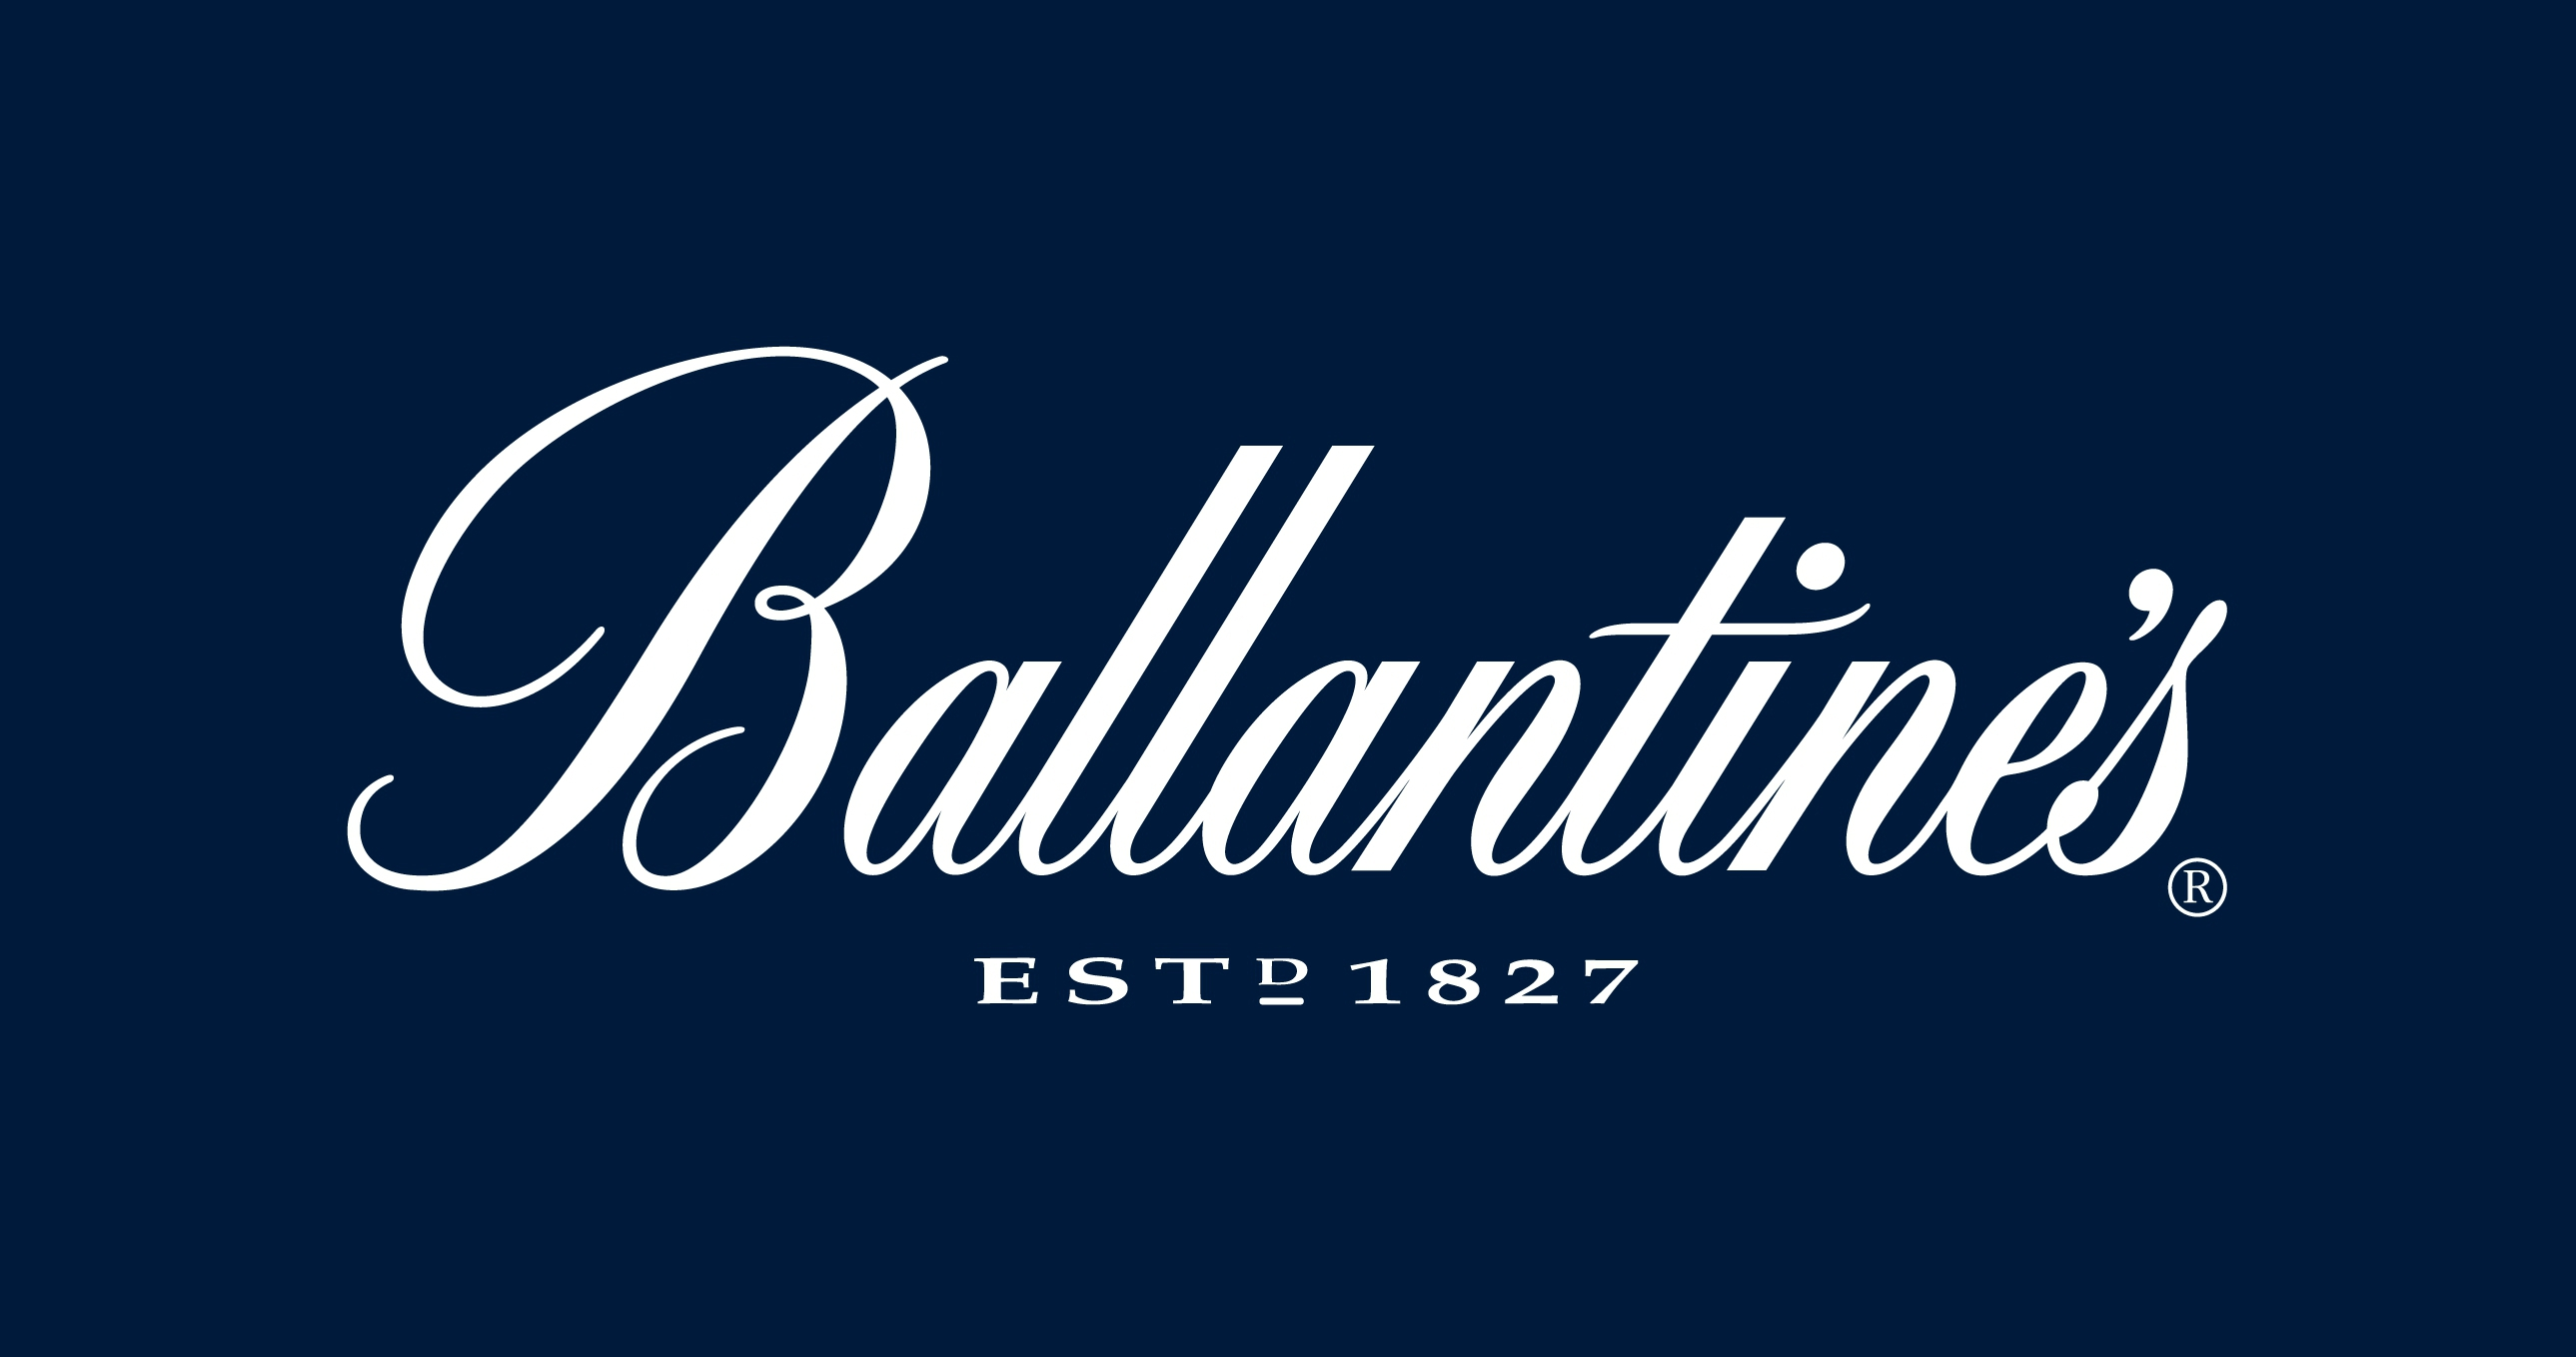 Ballantines Wallpaper